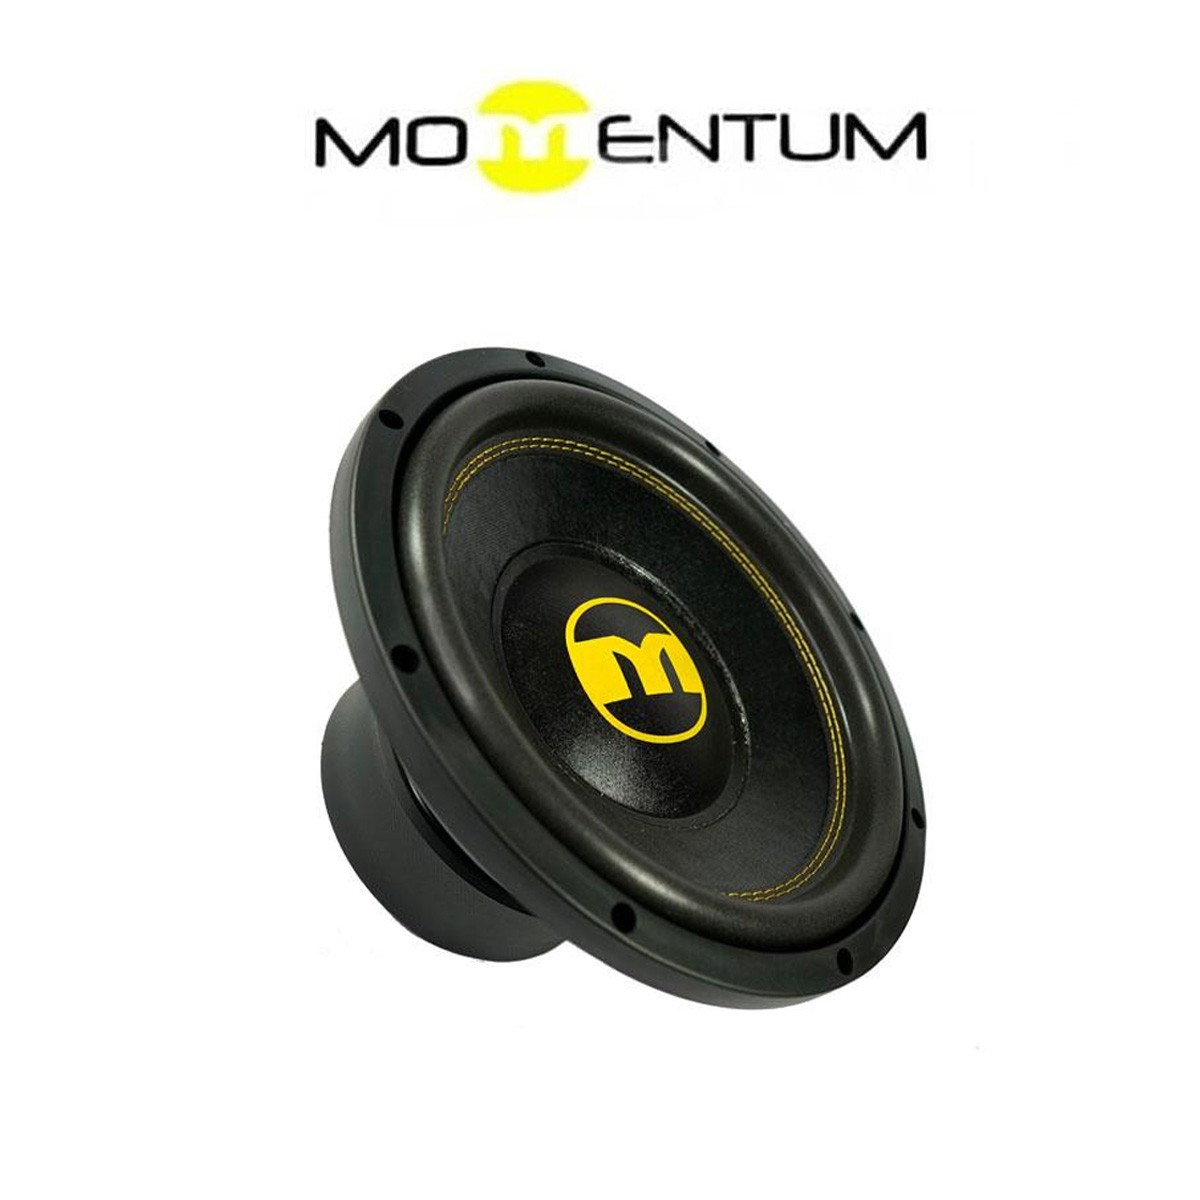 MOMENTUM DMD-210 - SUBWOOFER PASIF 10 INCHI